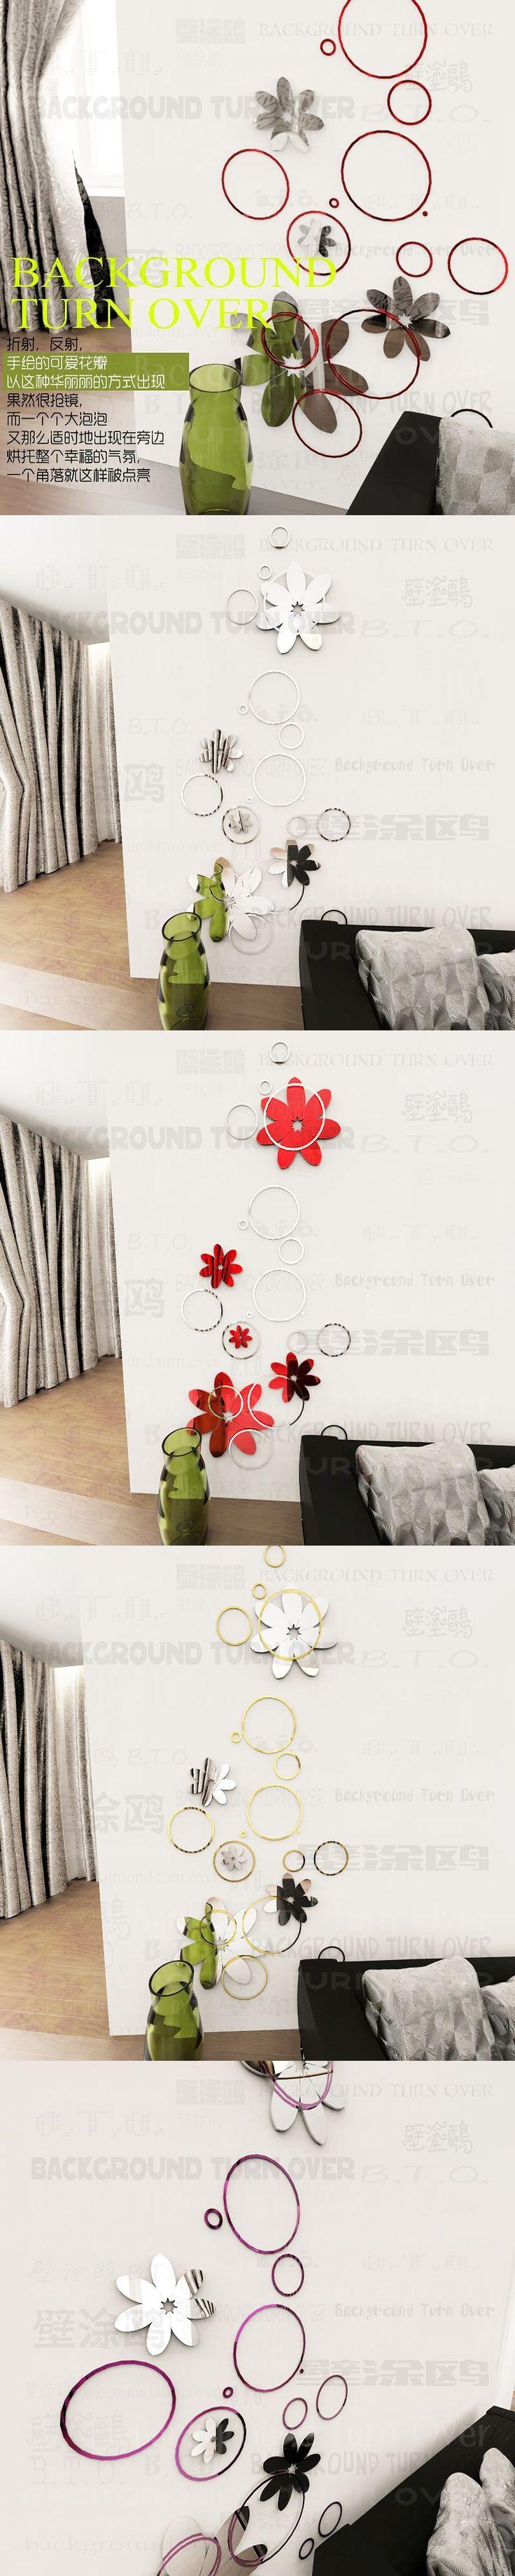 DIY creative fashion spring nature circle flower backdrops 3D mirror wall stickers home decor living room CQL-016 $24.45